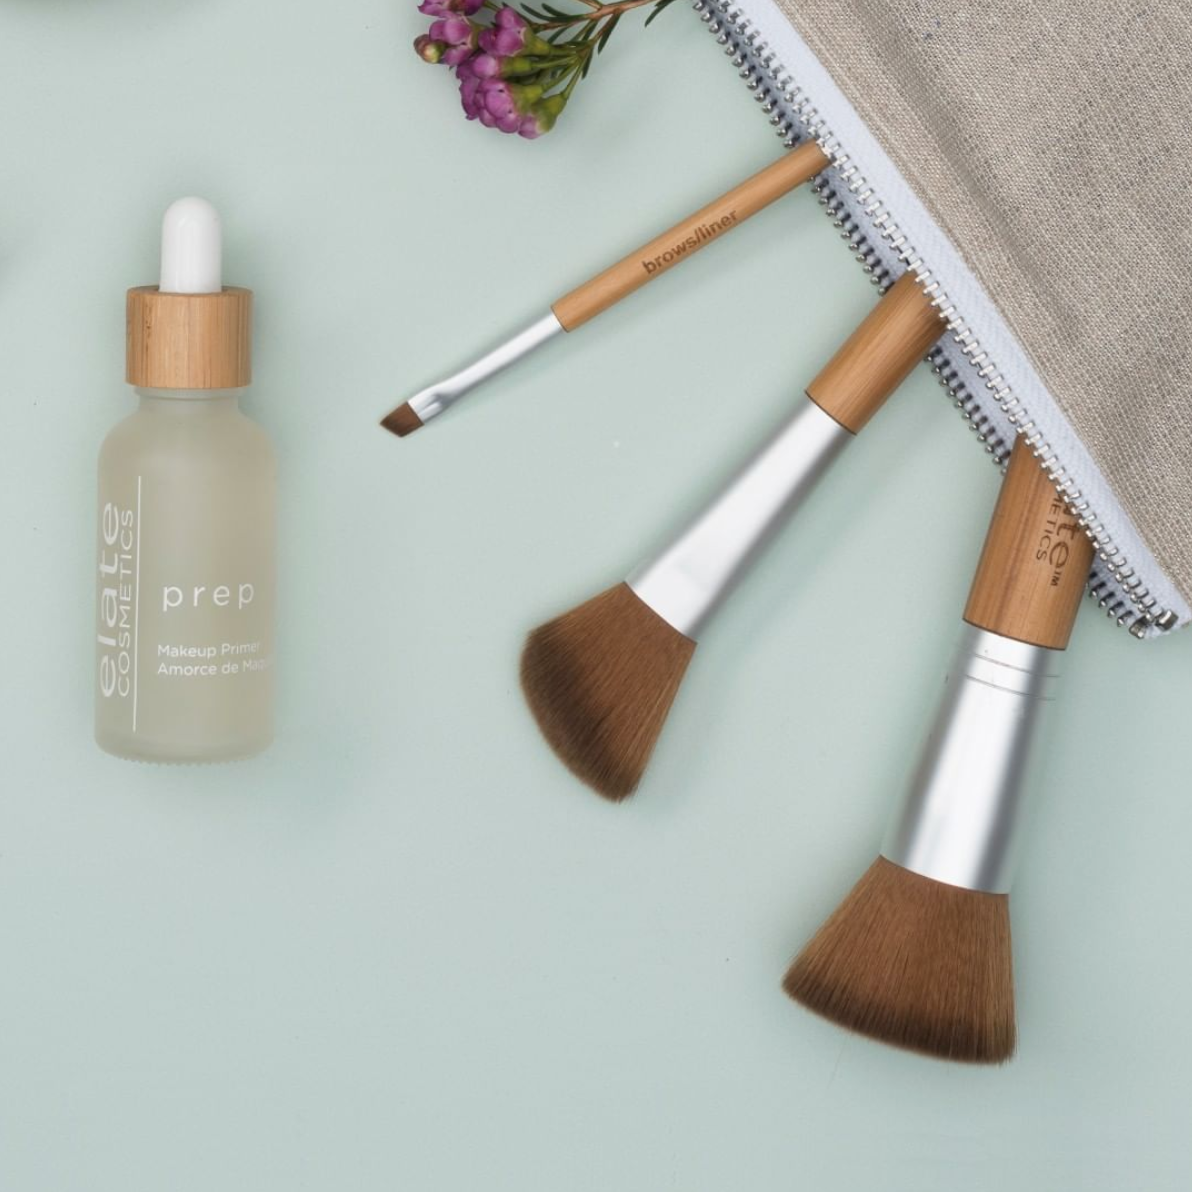 EarthHero - Prep Natural Makeup Primer - 2